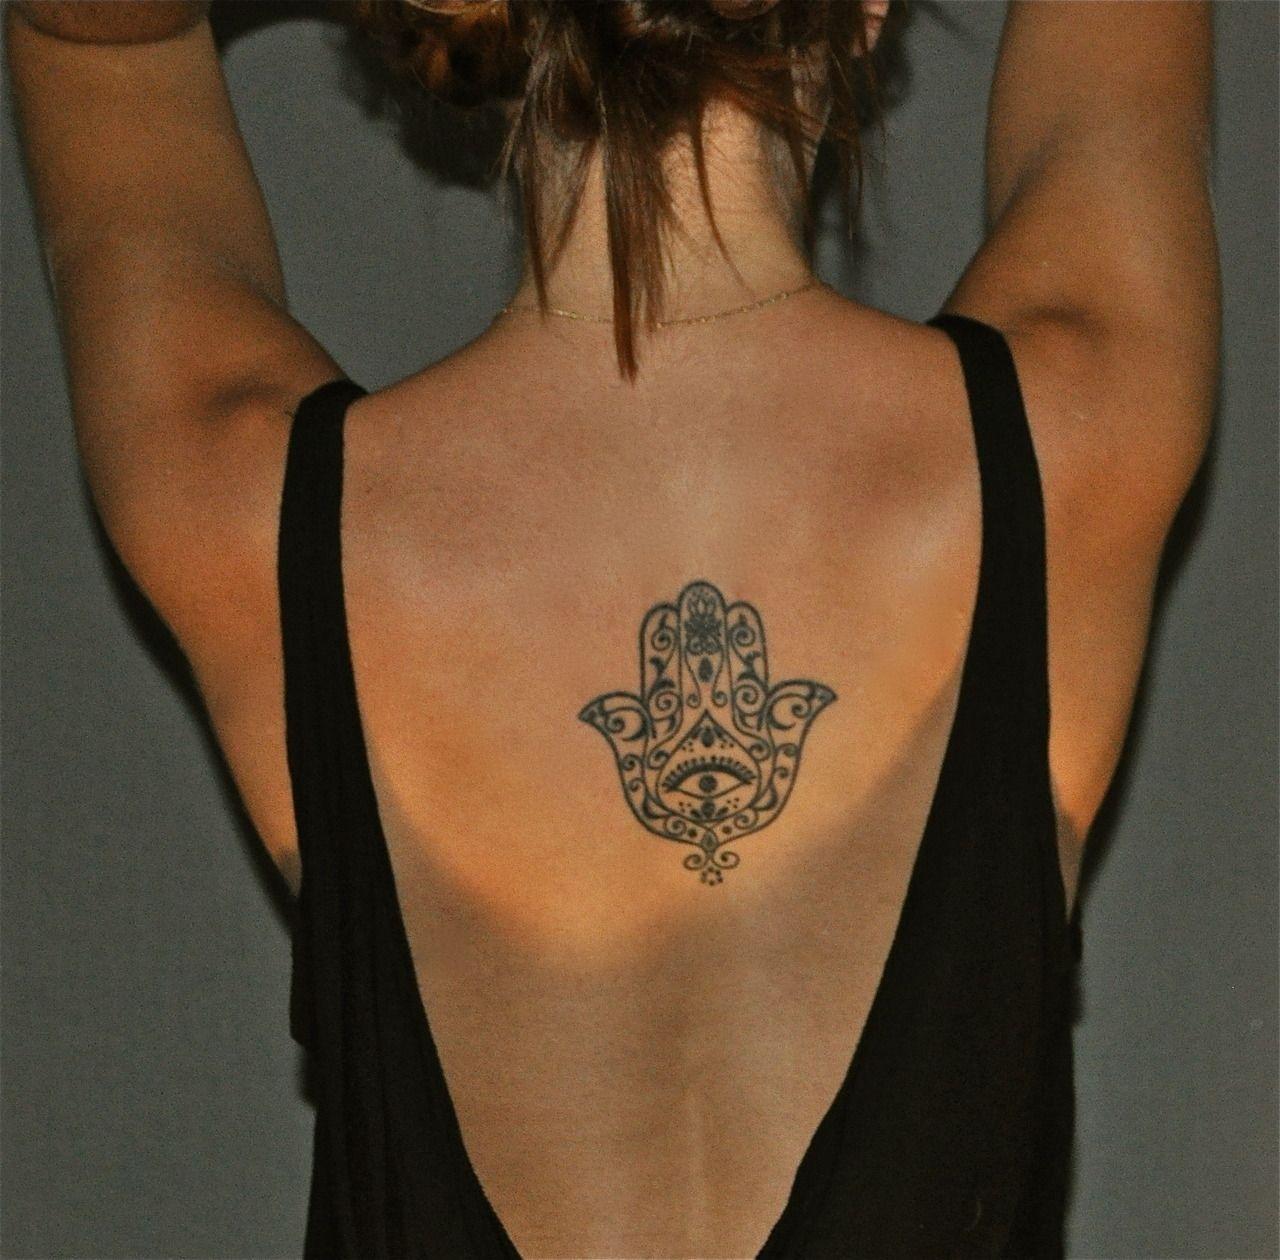 Pin De Minami Sugiura En Inked Tatuajes Del Mal De Ojo Tatuaje De Mano Hamsa Tatuajes De Arte Corporal